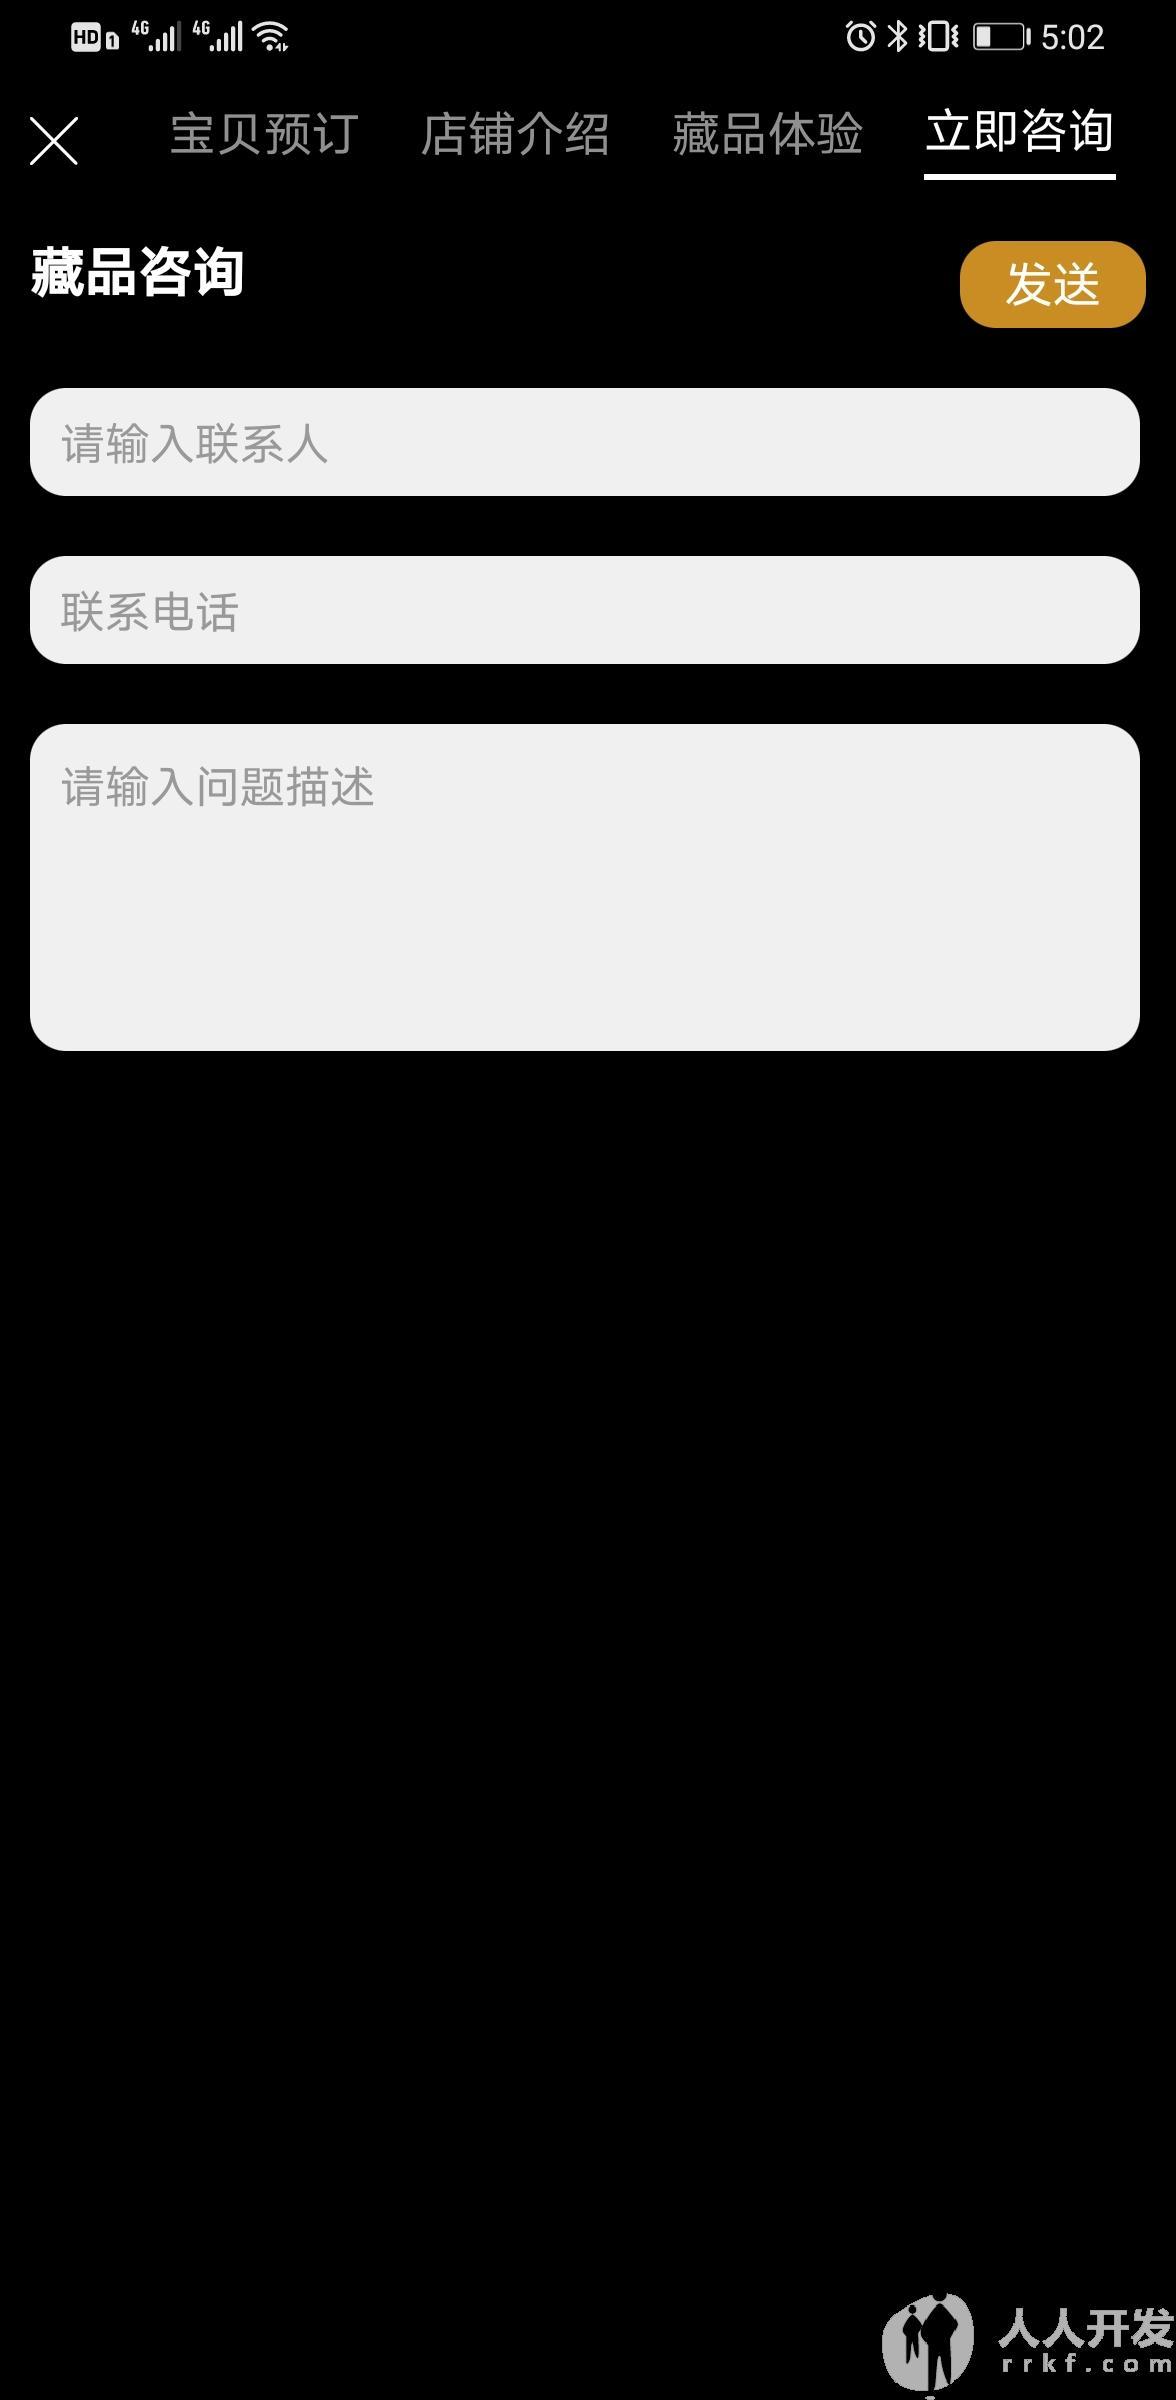 Screenshot_20210423_170208_com.yiyuanyoudao.app.jpg